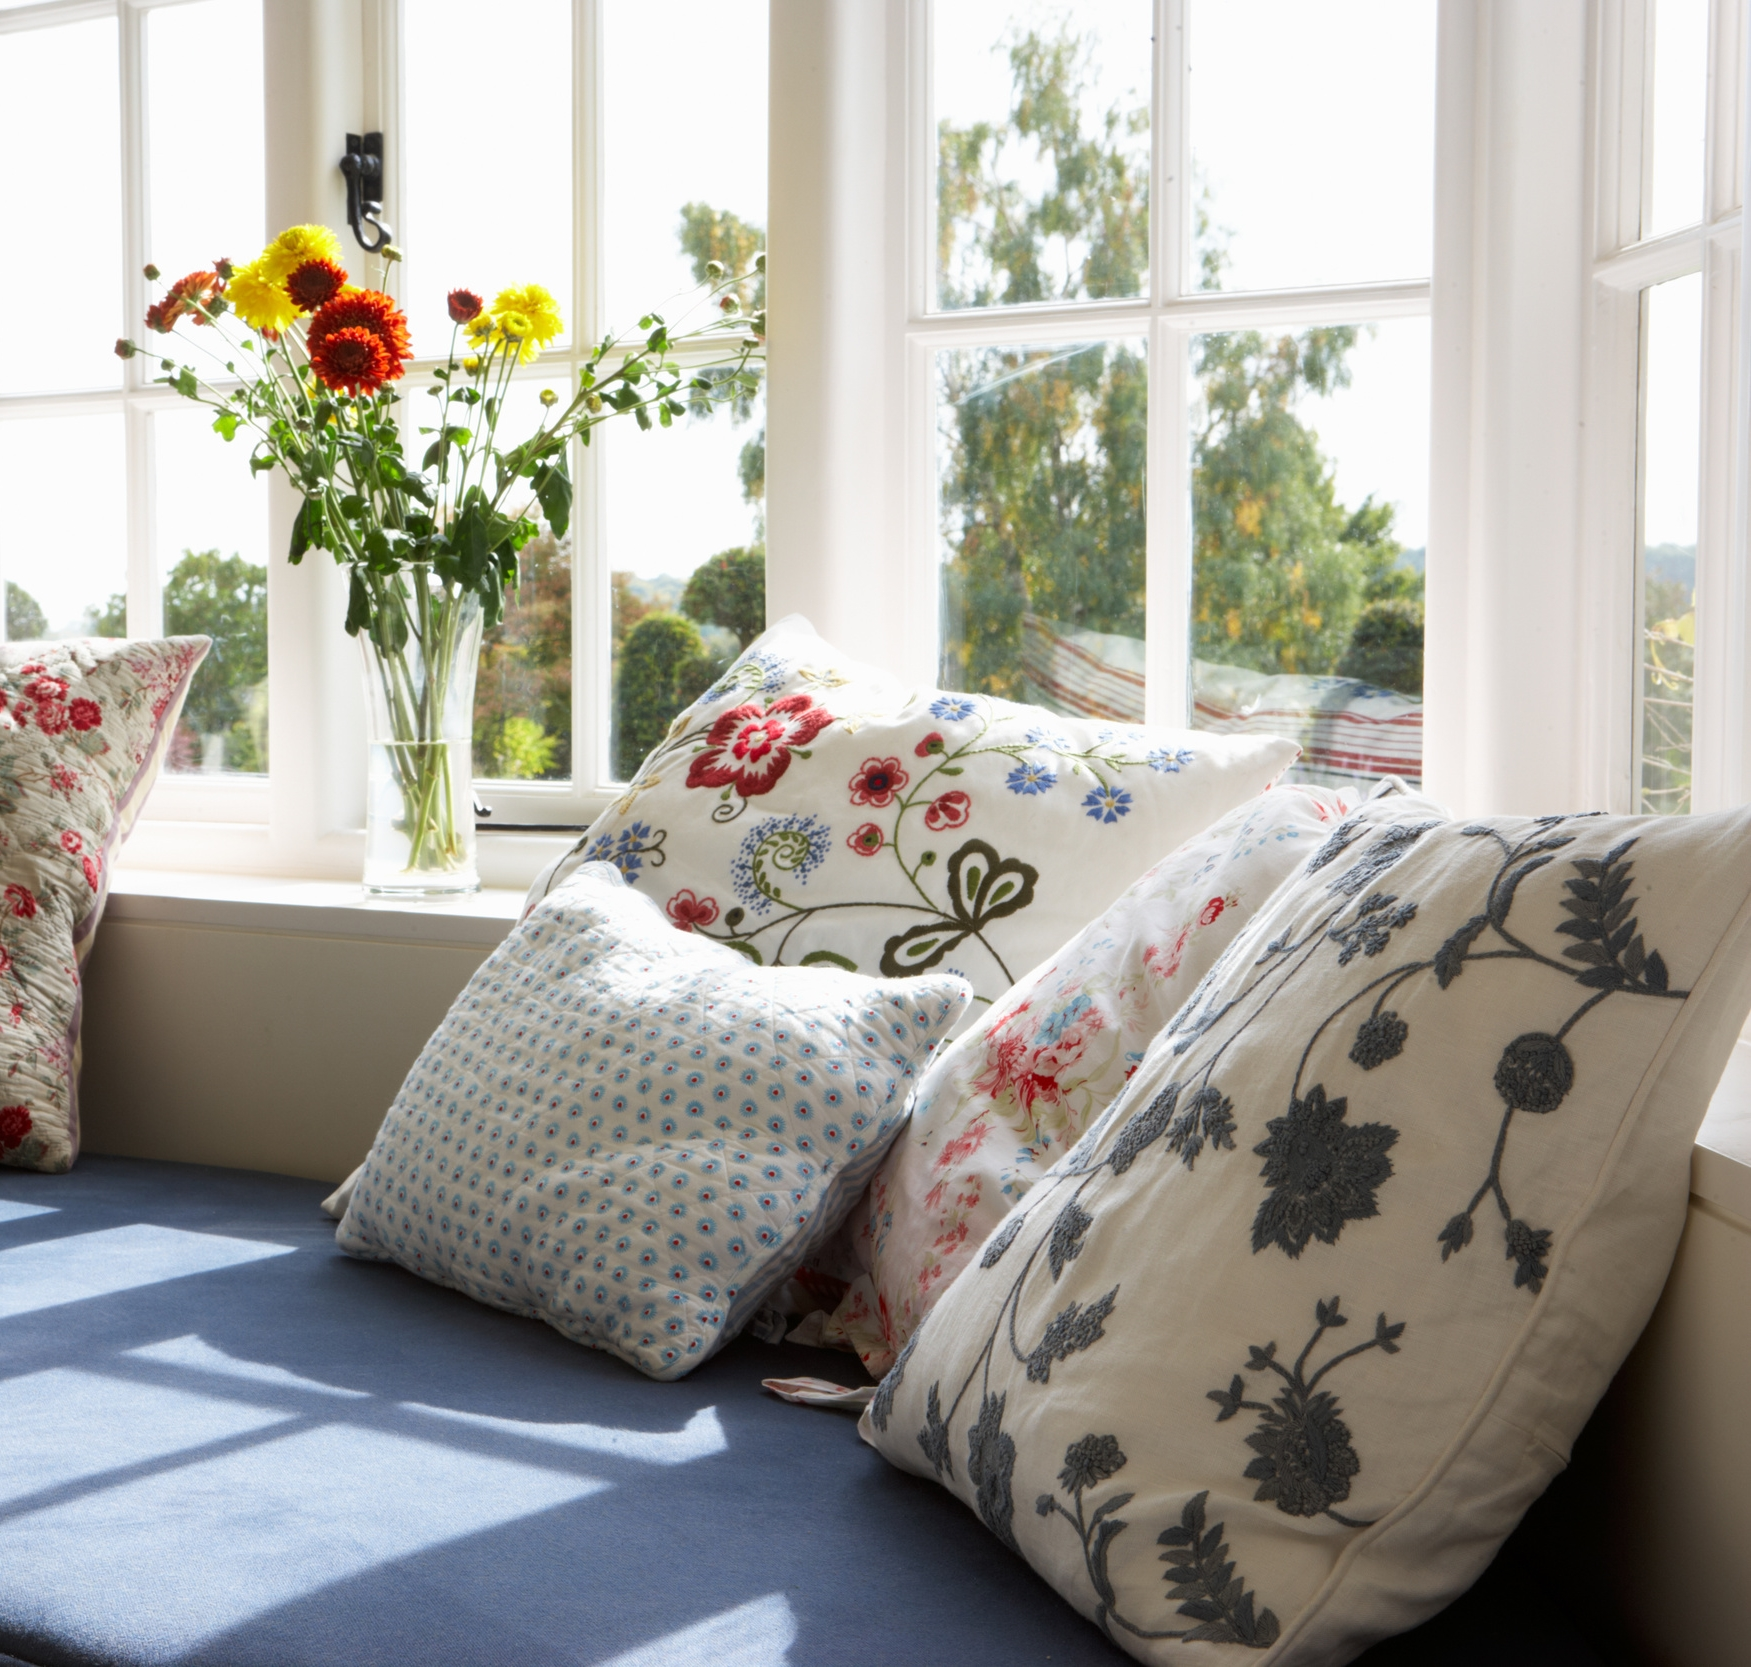 inspiring-home-interior-decor-florida-designer-spectacular-spaces-61226657.jpg